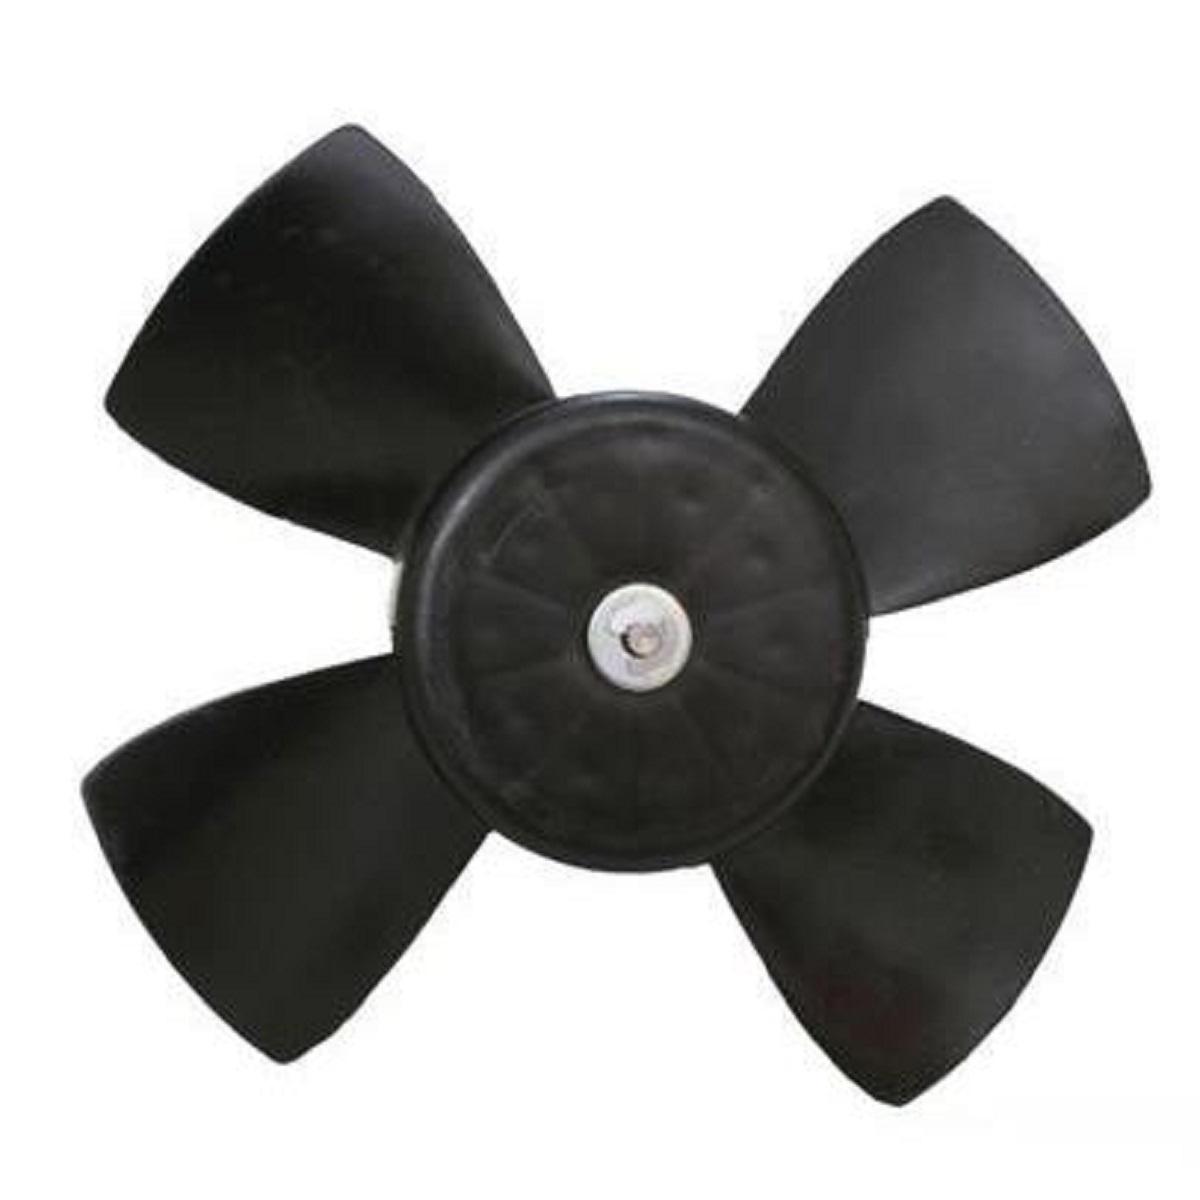 Eletroventilador KADETT MONZA - Sem Ar Condicionado (C2061)